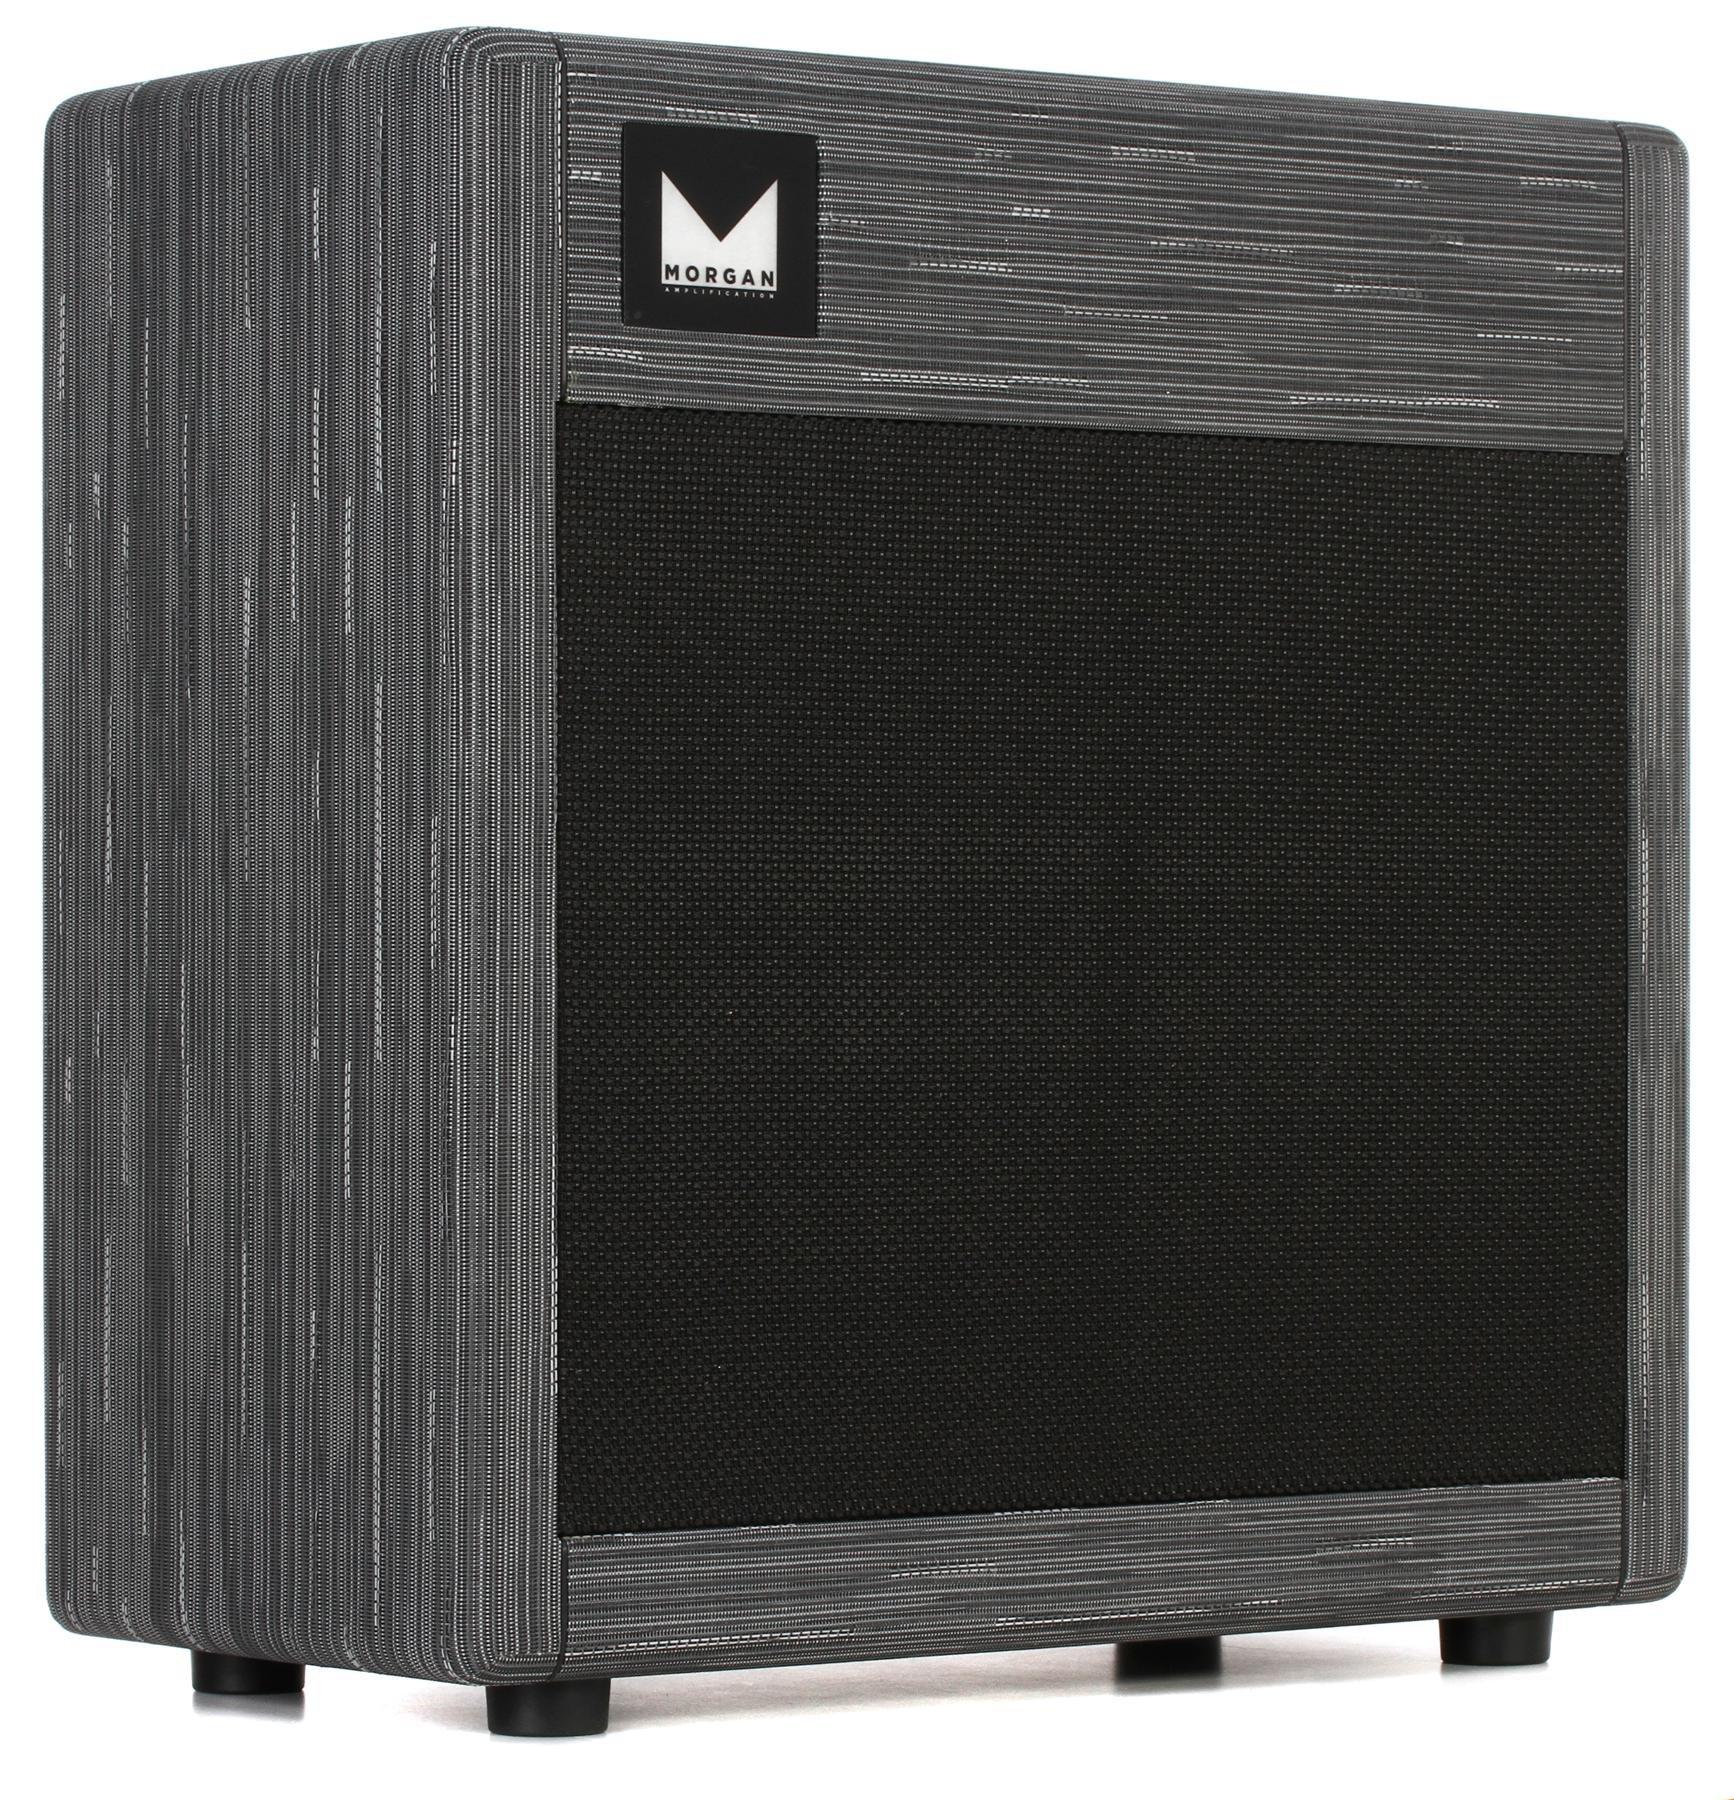 Morgan Amps Mvp23 Combo 23 Watt 1x12 Hand Wired Tube 12w Audio Amplifier Twilight